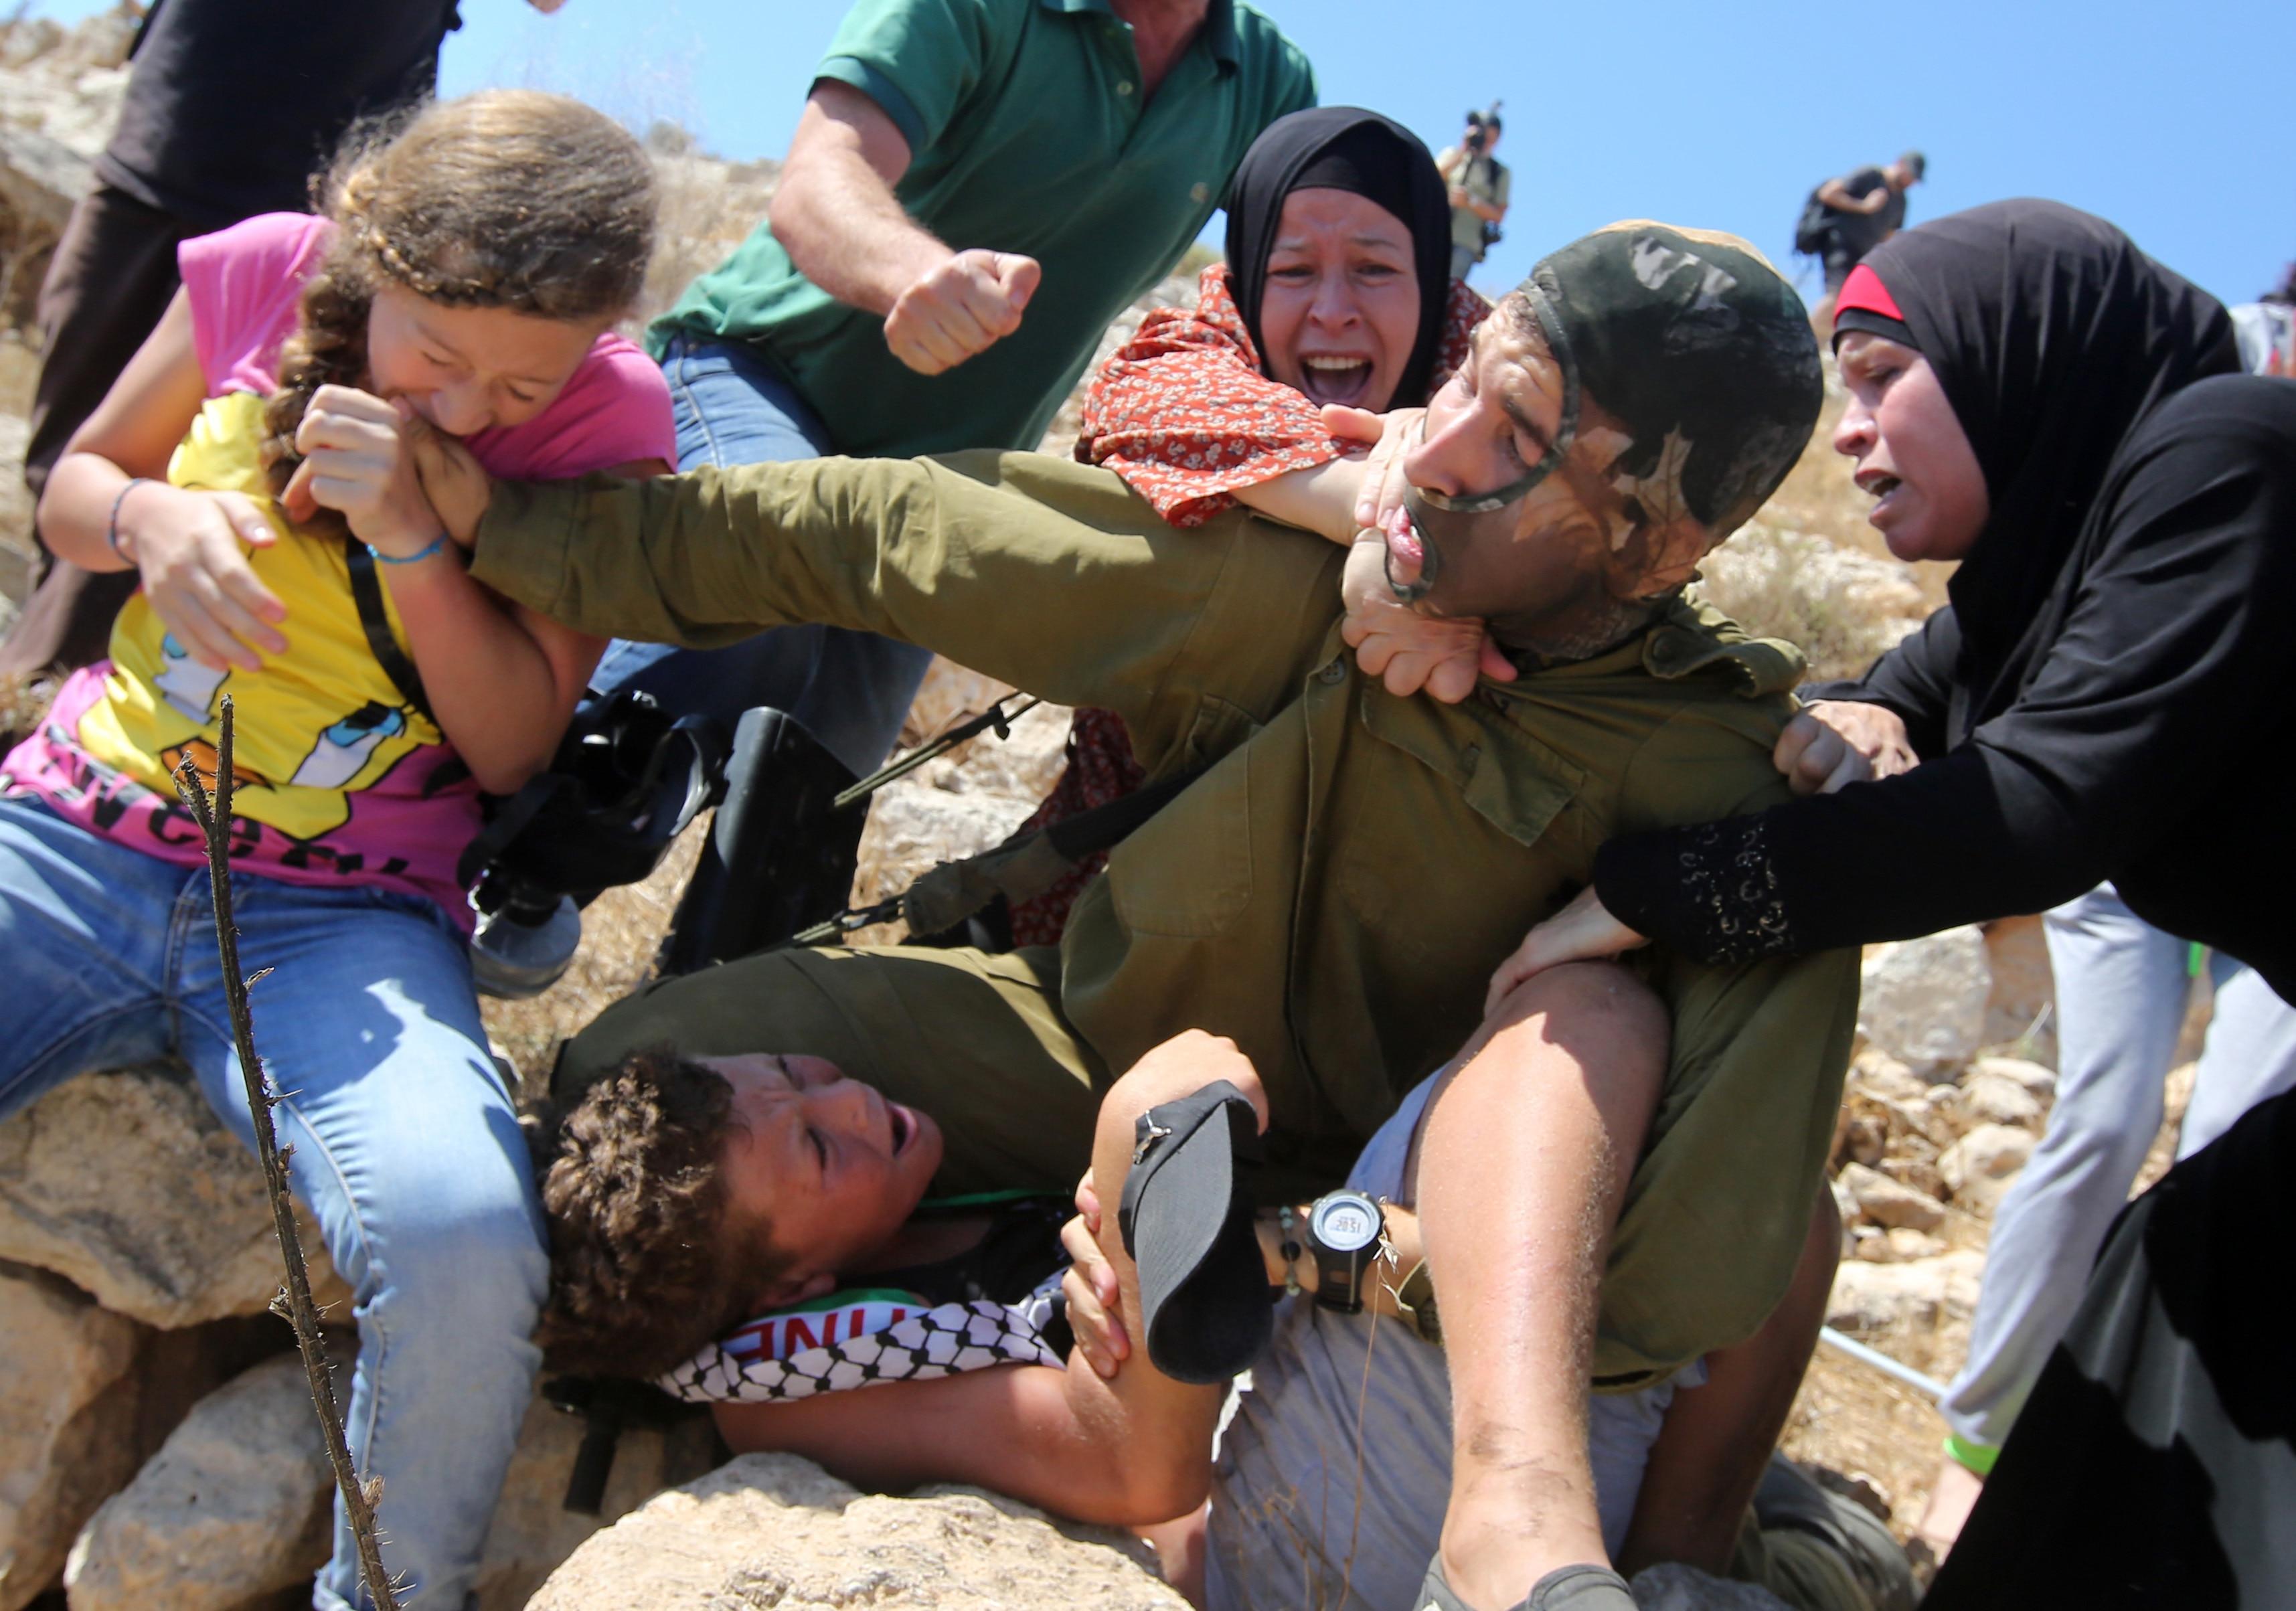 Vídeo mostra soldado israelense prendendo criança